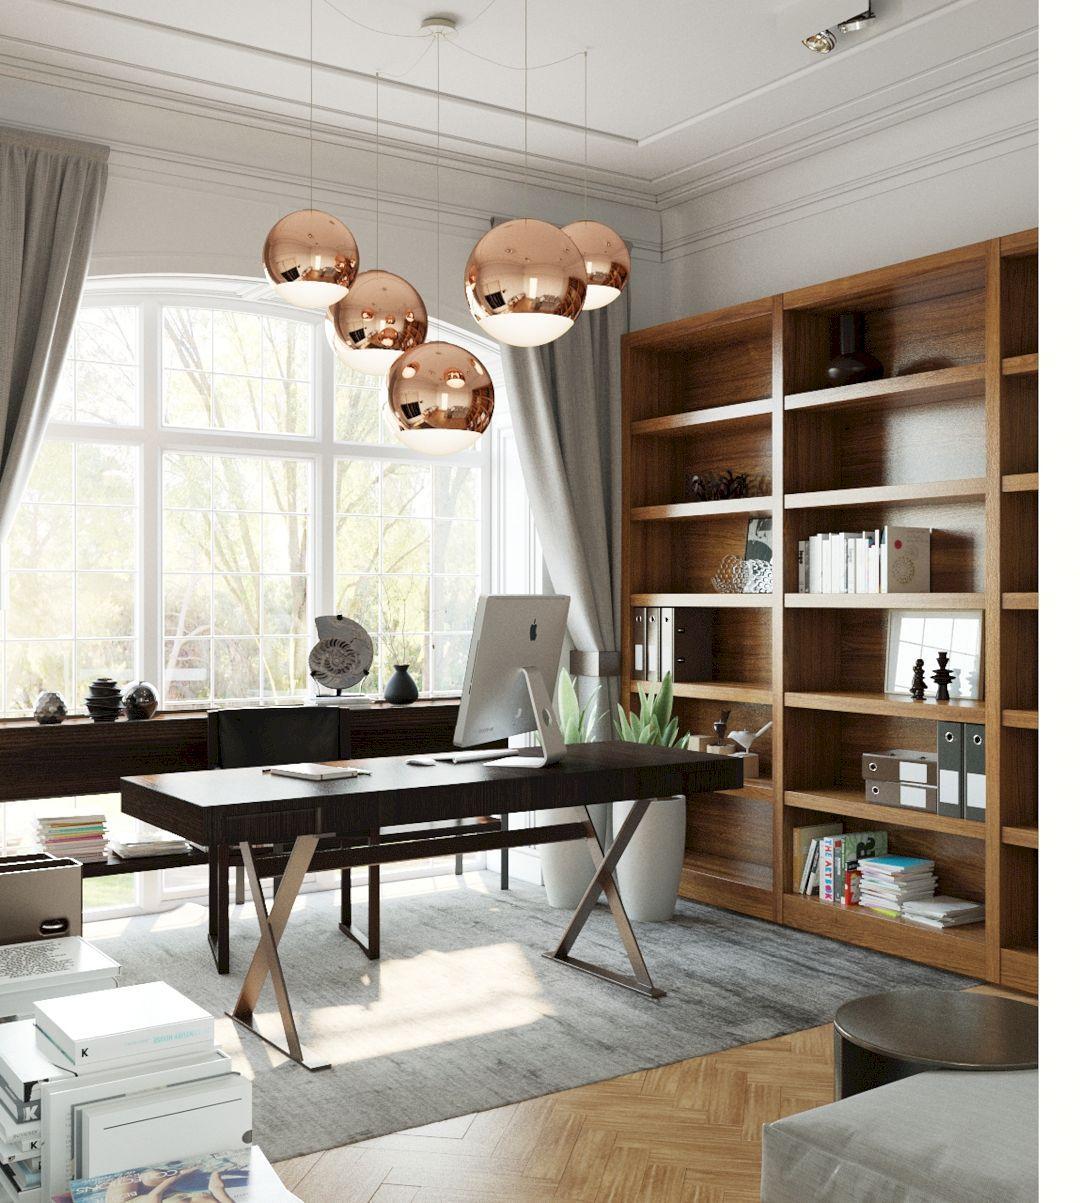 home office, wooden floor, white wall, large glass window, wooden shelves, chopper pendants, black office table, black chair, black cabinet